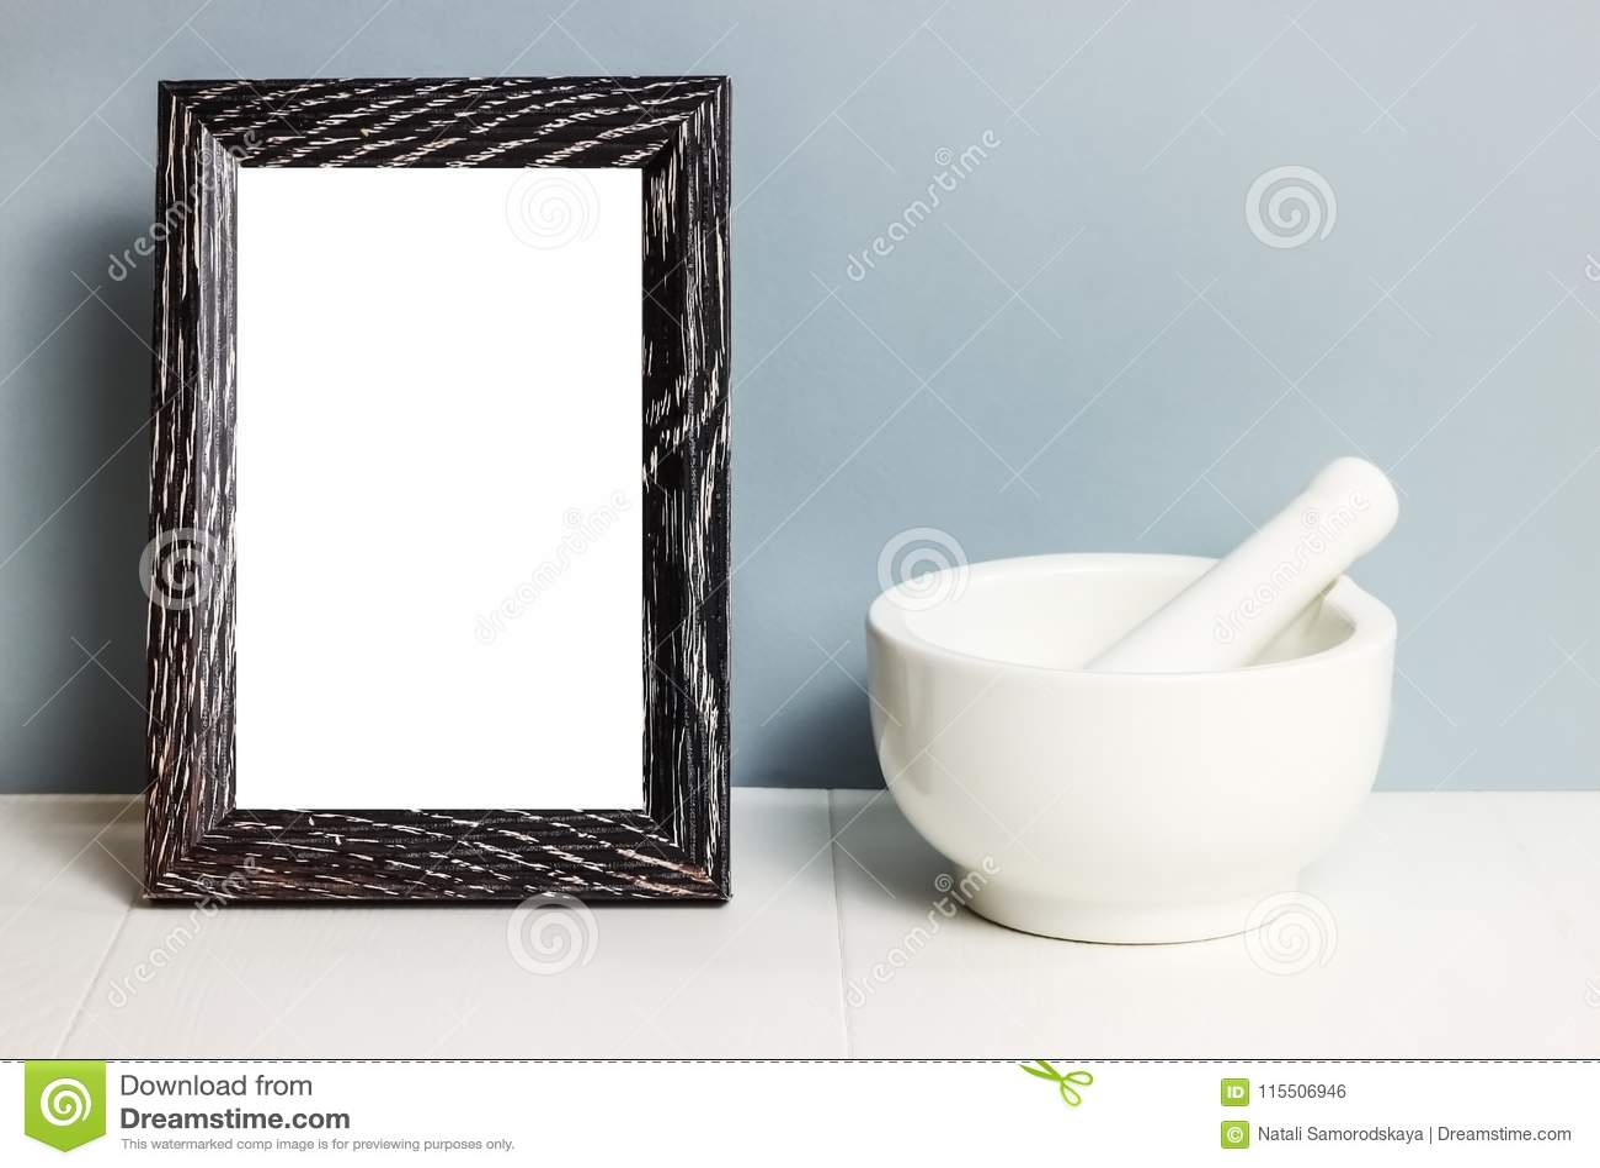 Mortar. Bowl For Press. White Tableware On Table. Ceramic Stiff ...